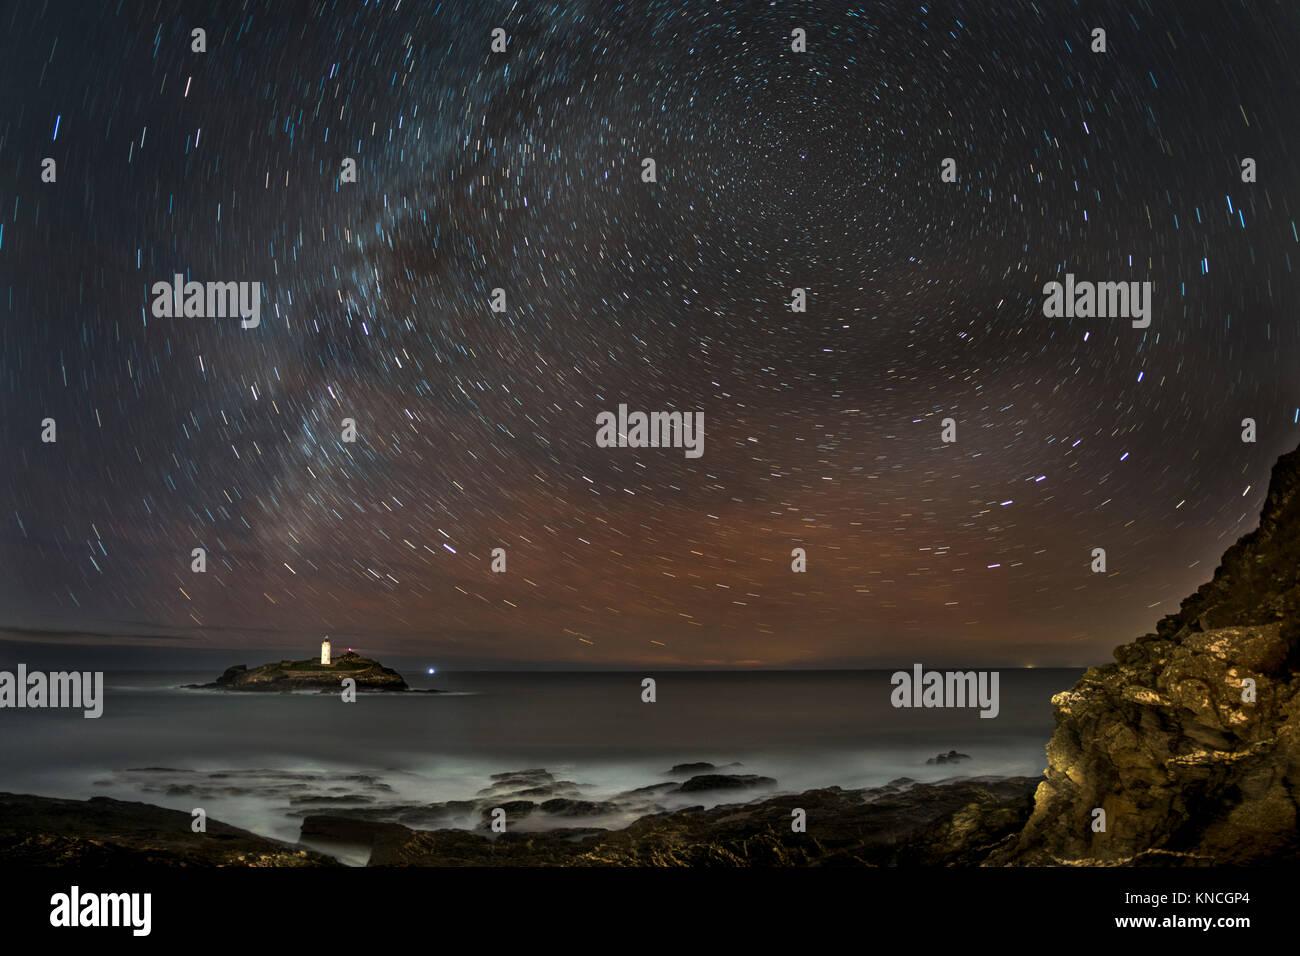 Godrevy; Star Trails; Cornwall; UK - Stock Image